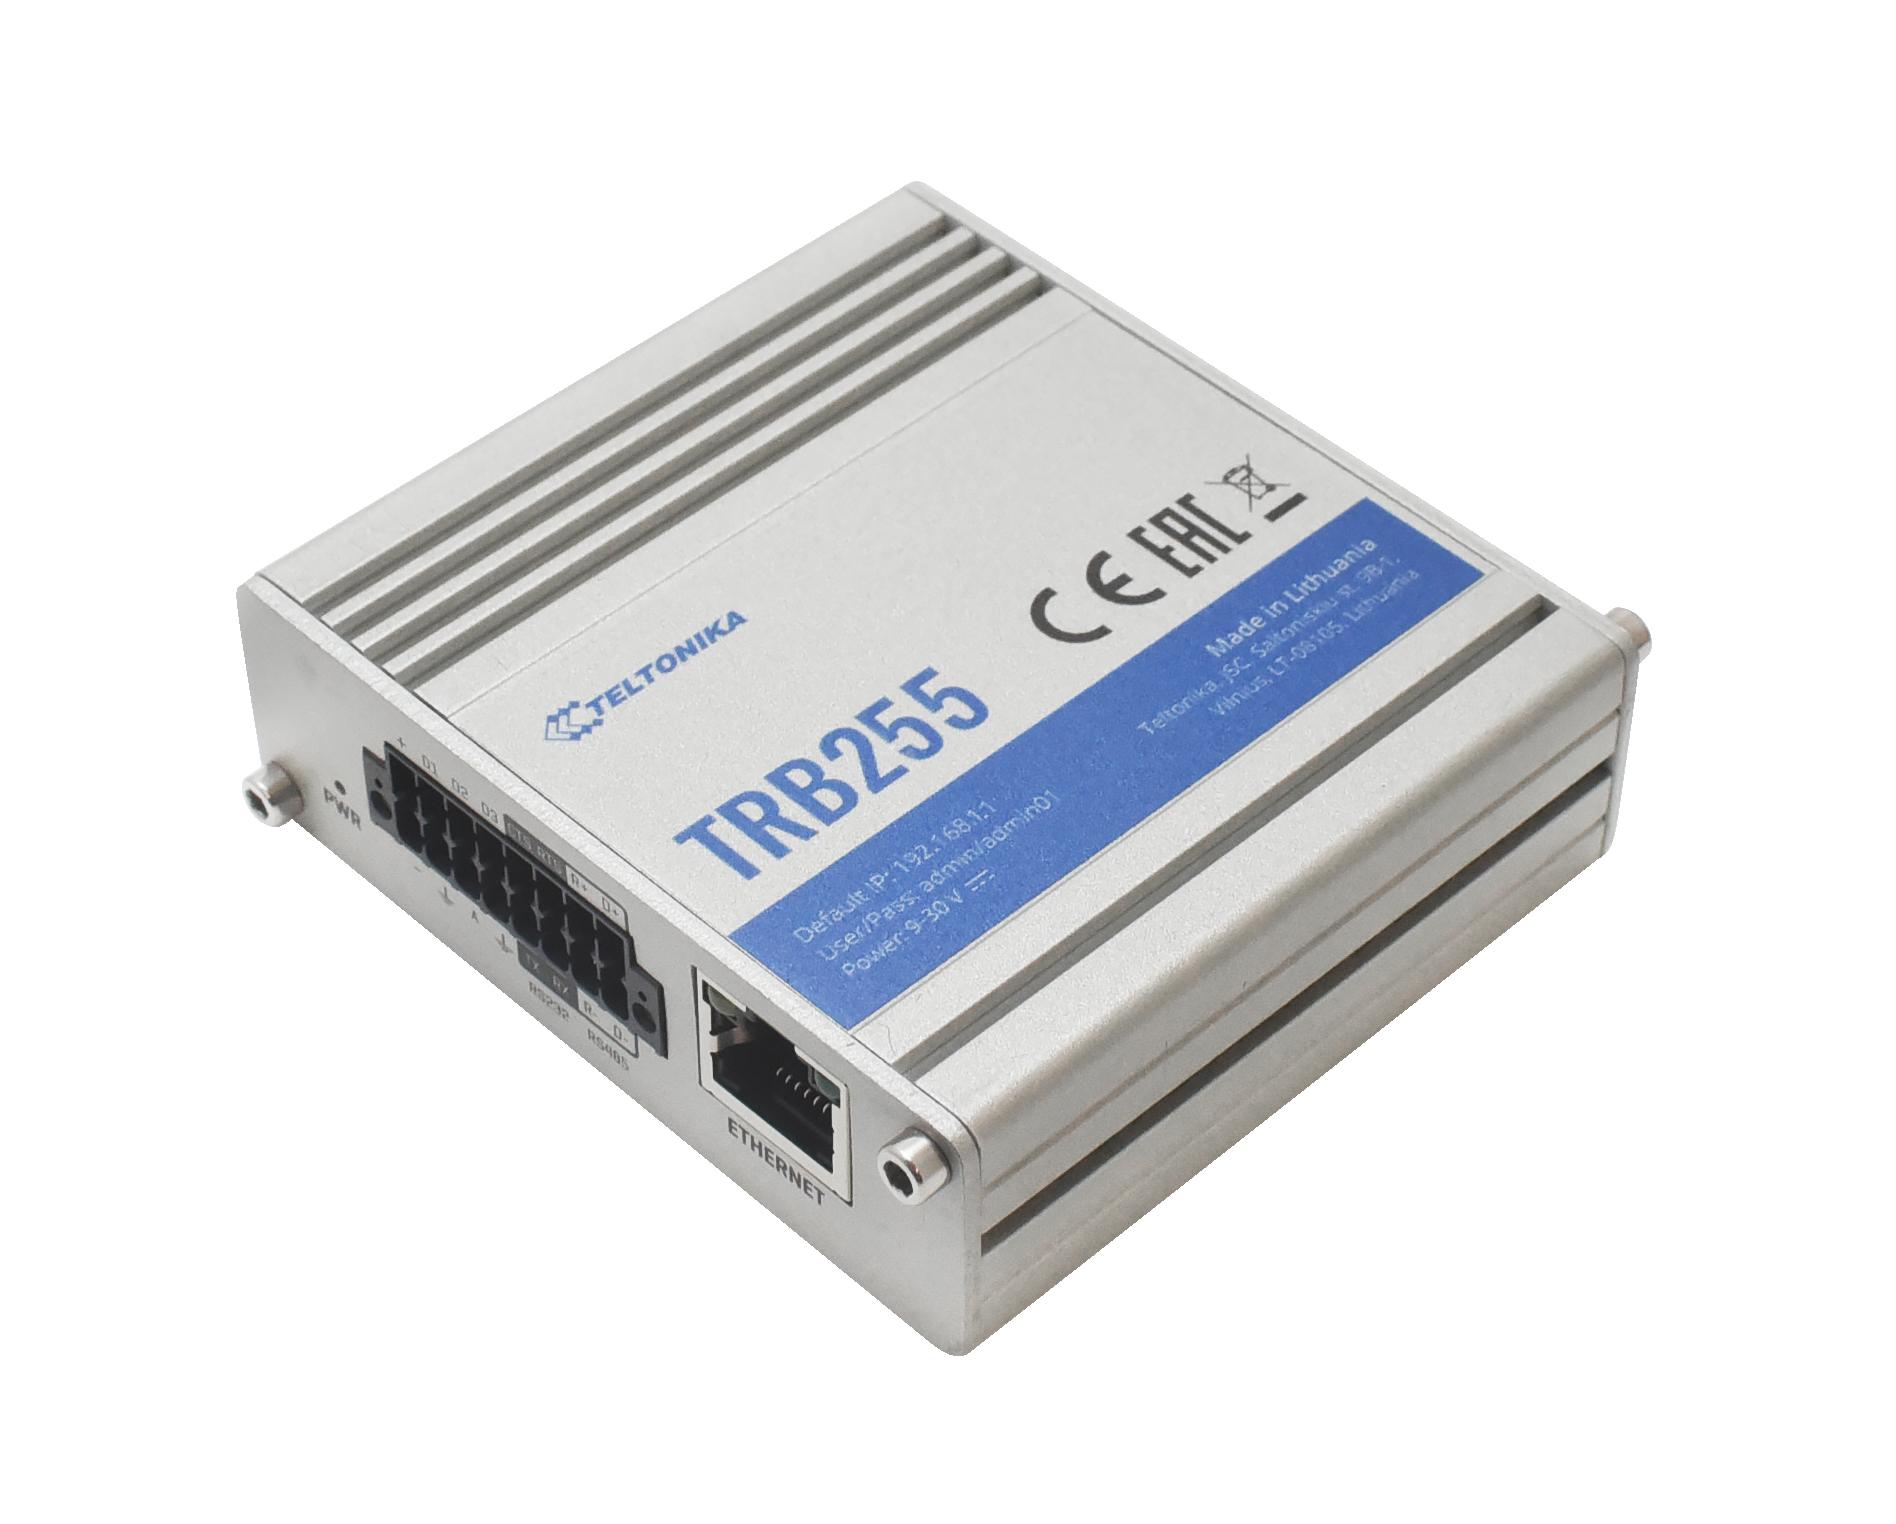 TRB255 – Gateway 4G/LTE (Cat M1), NB-IoT, 2G Ethernet, RS232/485/422, DIO y GPS